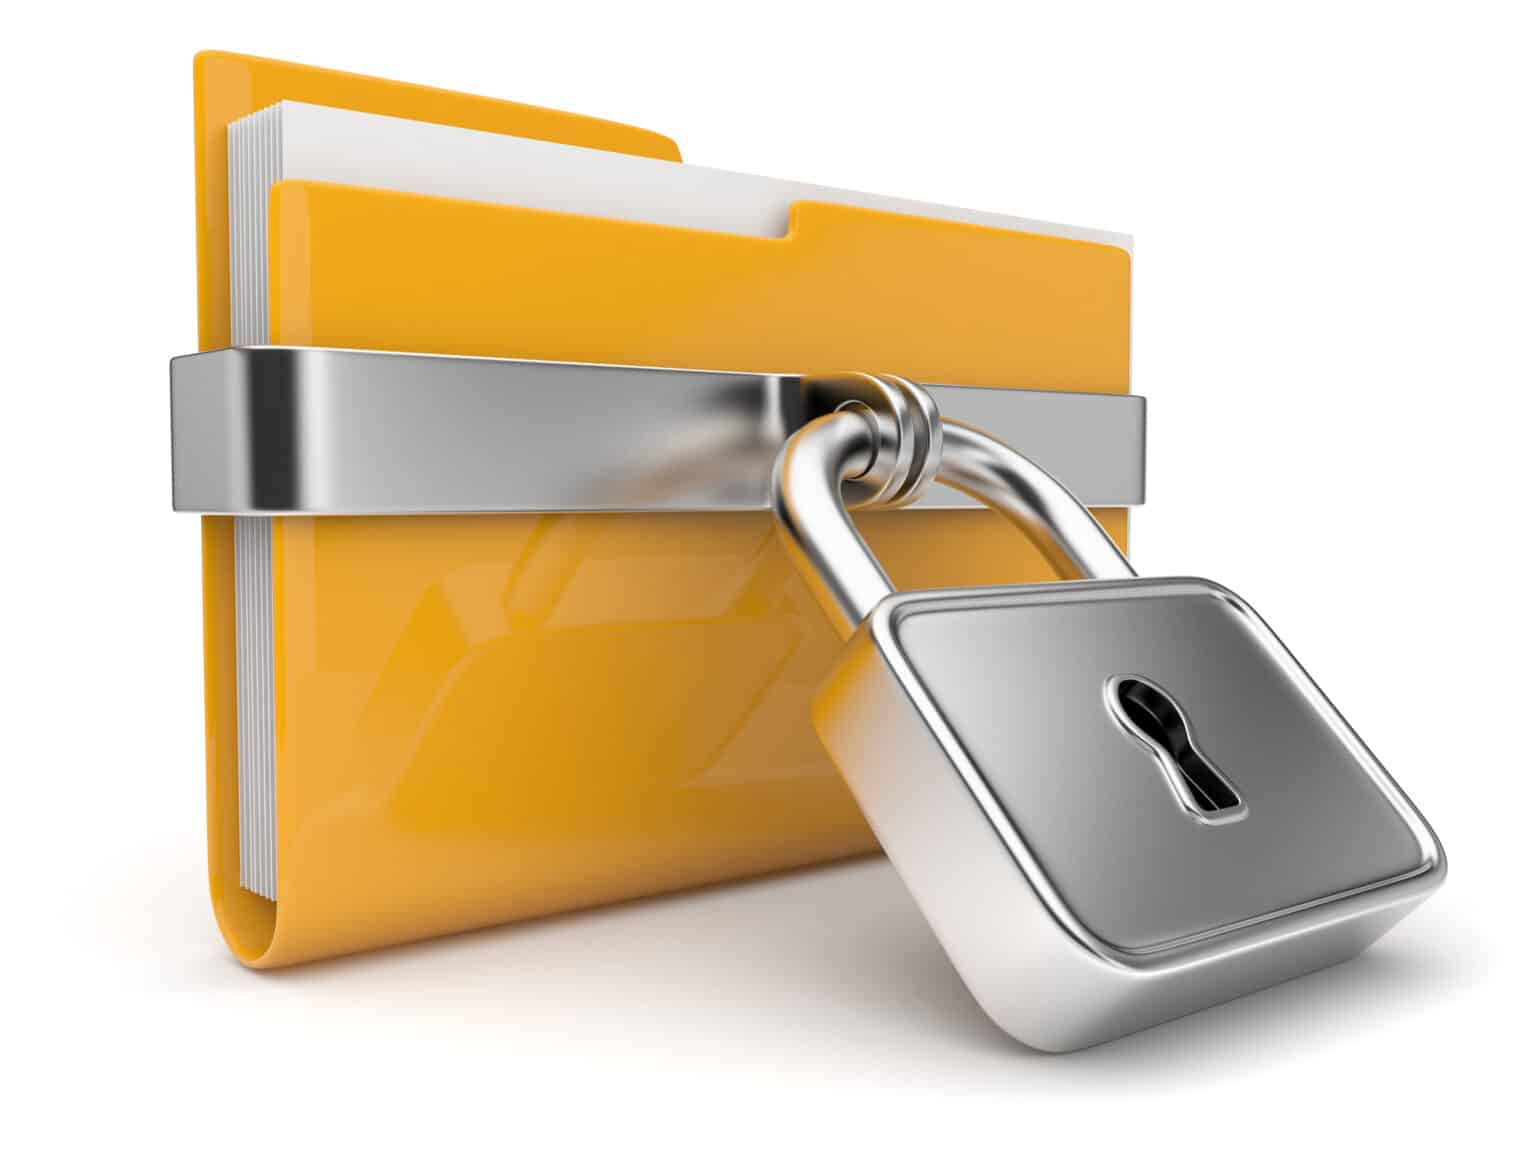 protect trade secret concept: folder secured with padlock